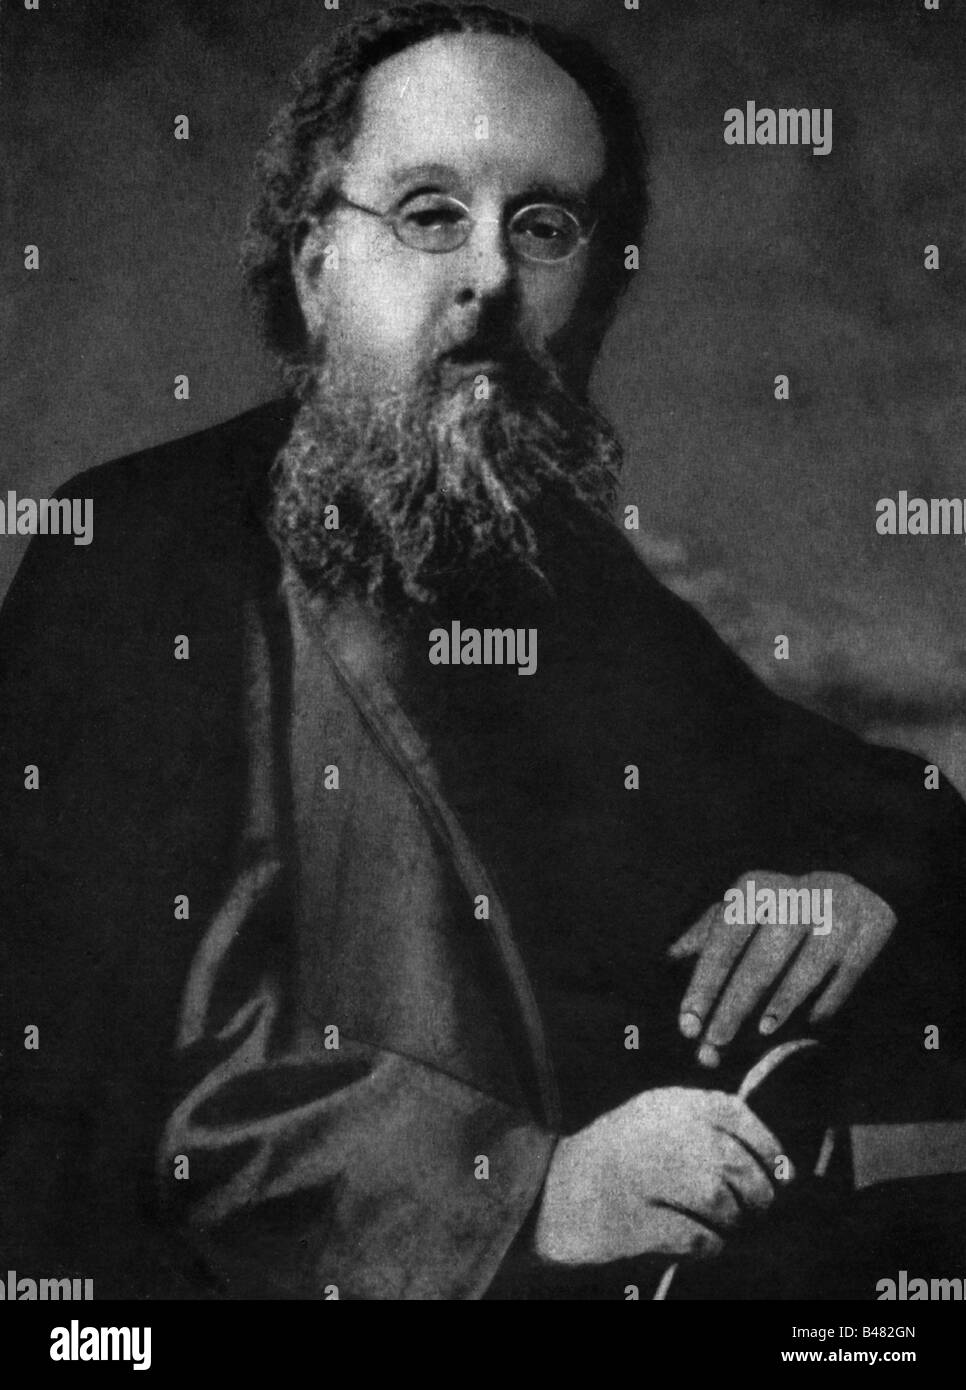 Tsiolkovsky, Konstantin Eduardovich, 17.9.1857 - 19.9.1935, russischer Wissenschaftler (Physiker, Mathematikwissenschaftler), Stockfoto